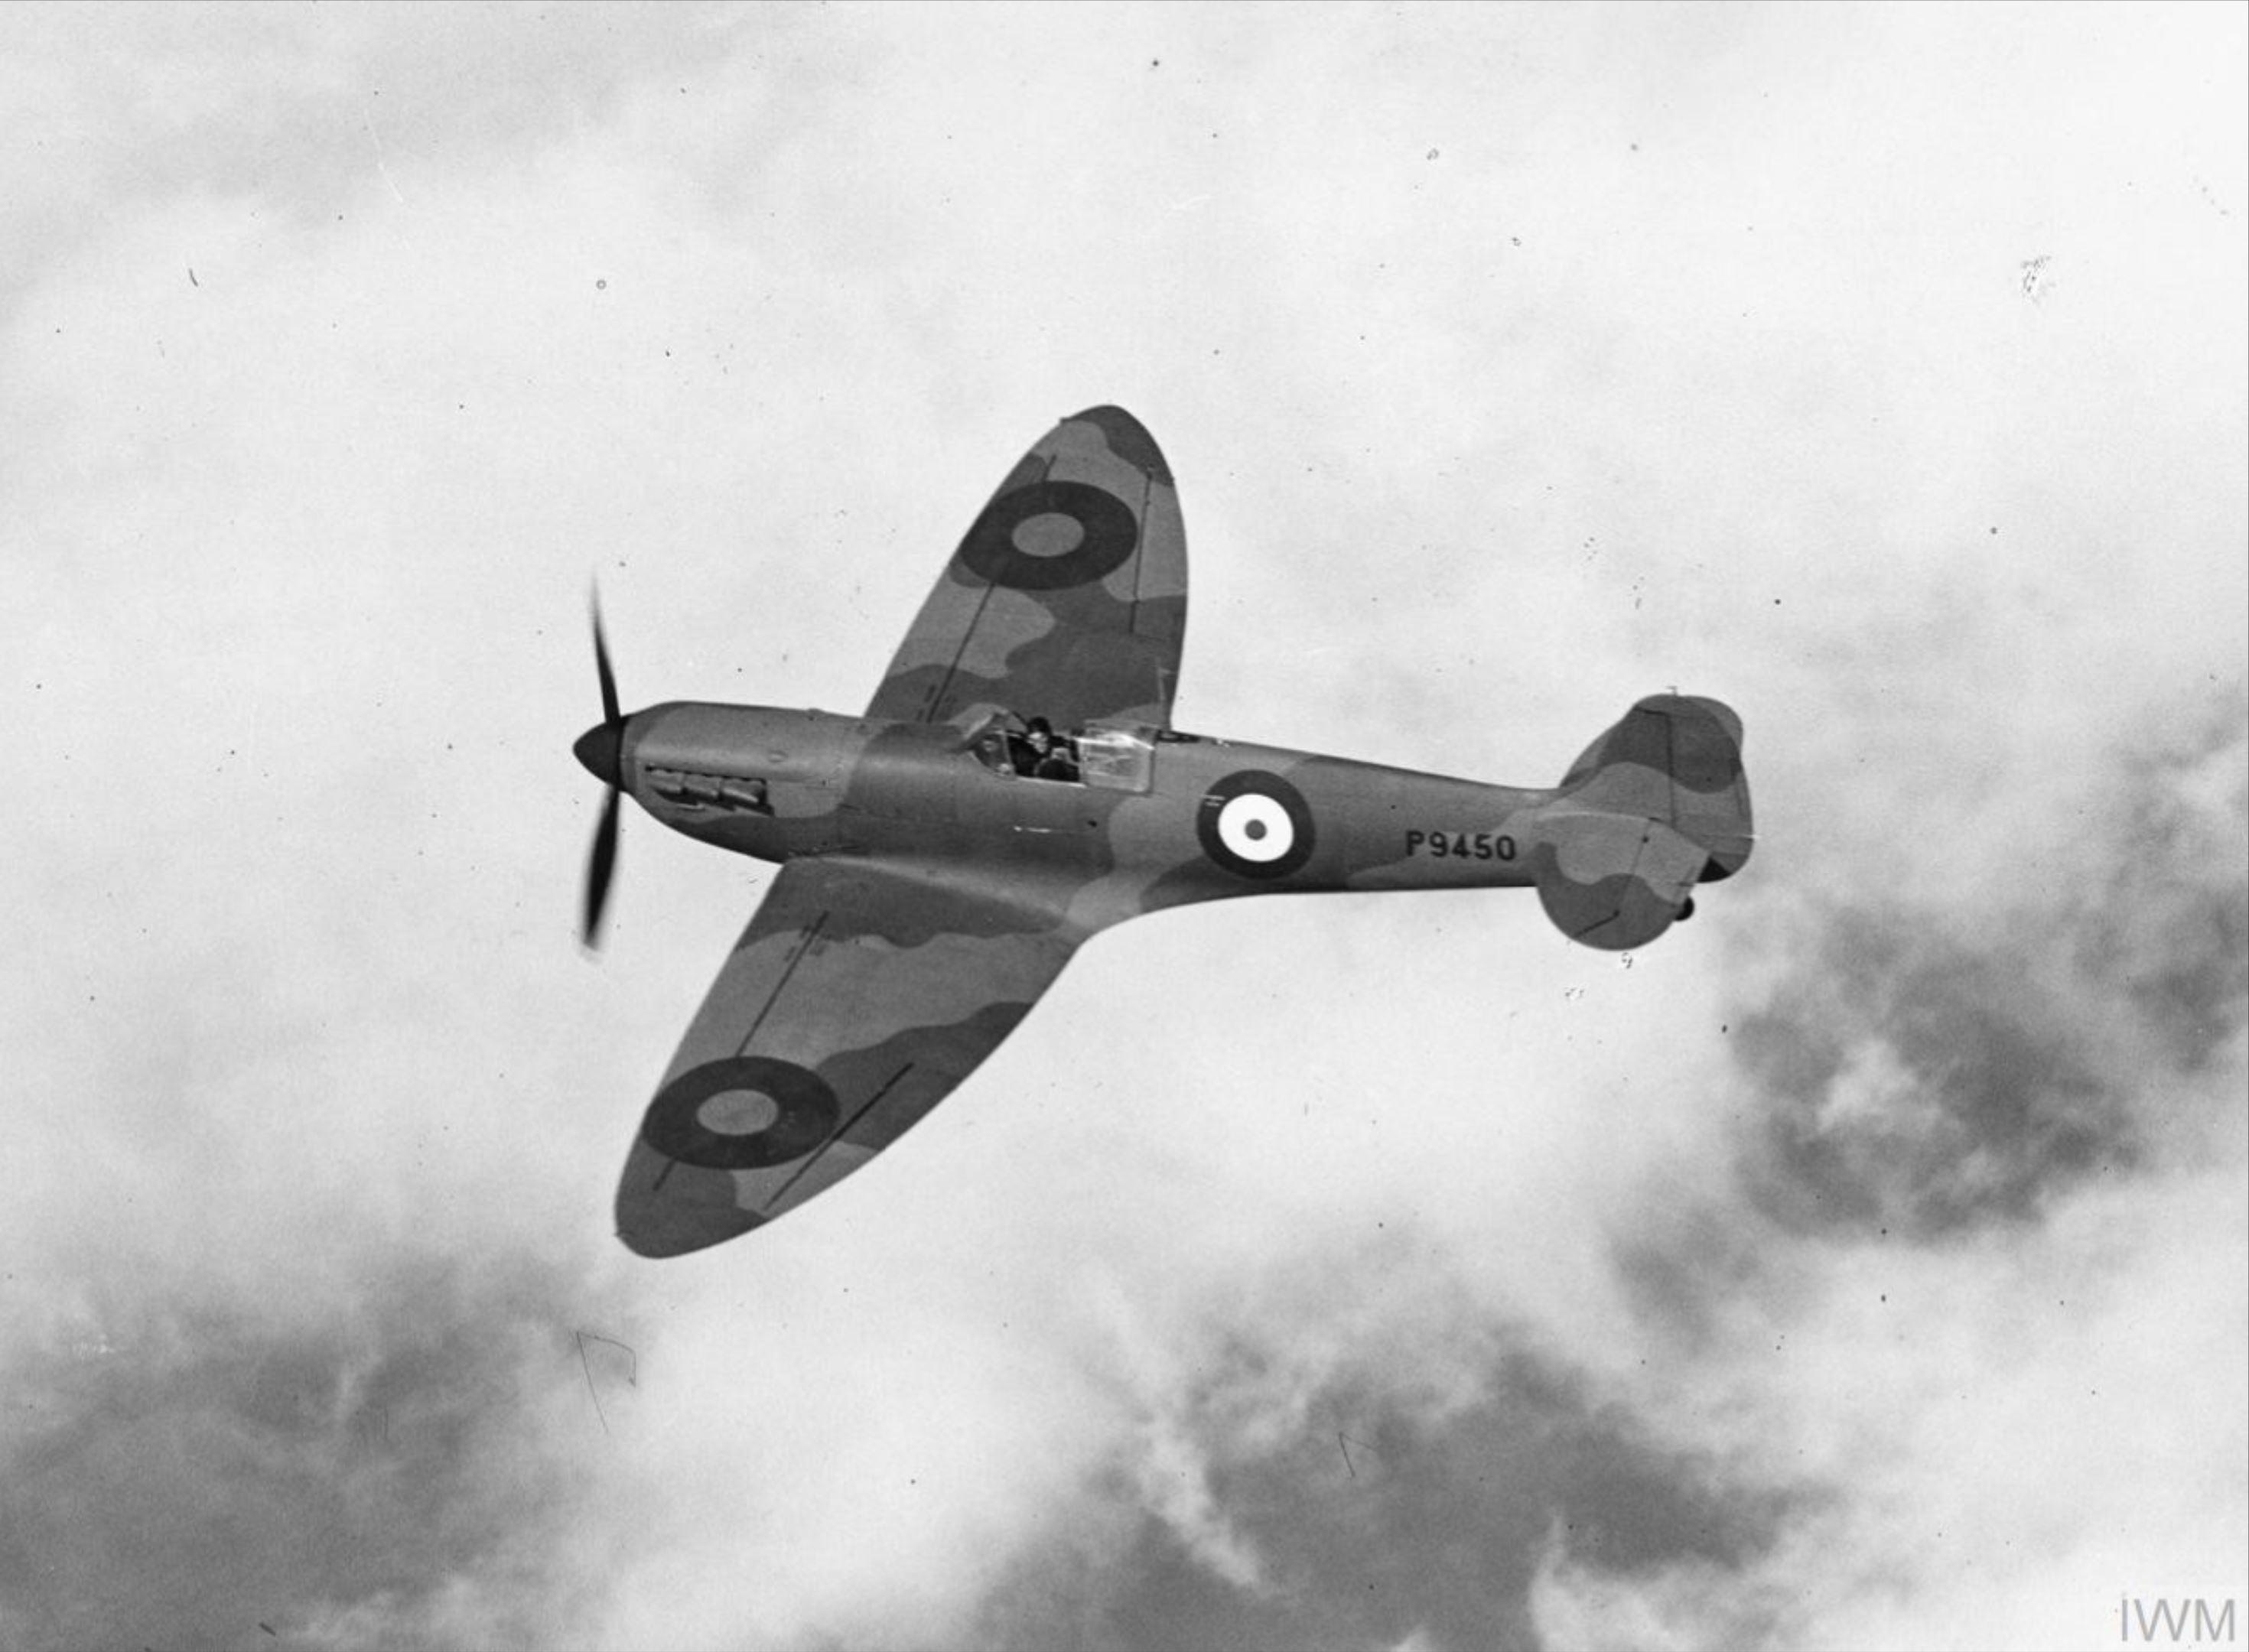 Spitfire MkI factory fresh P9450 Apr 1940 later RAF 64Sqn IWM HU104746